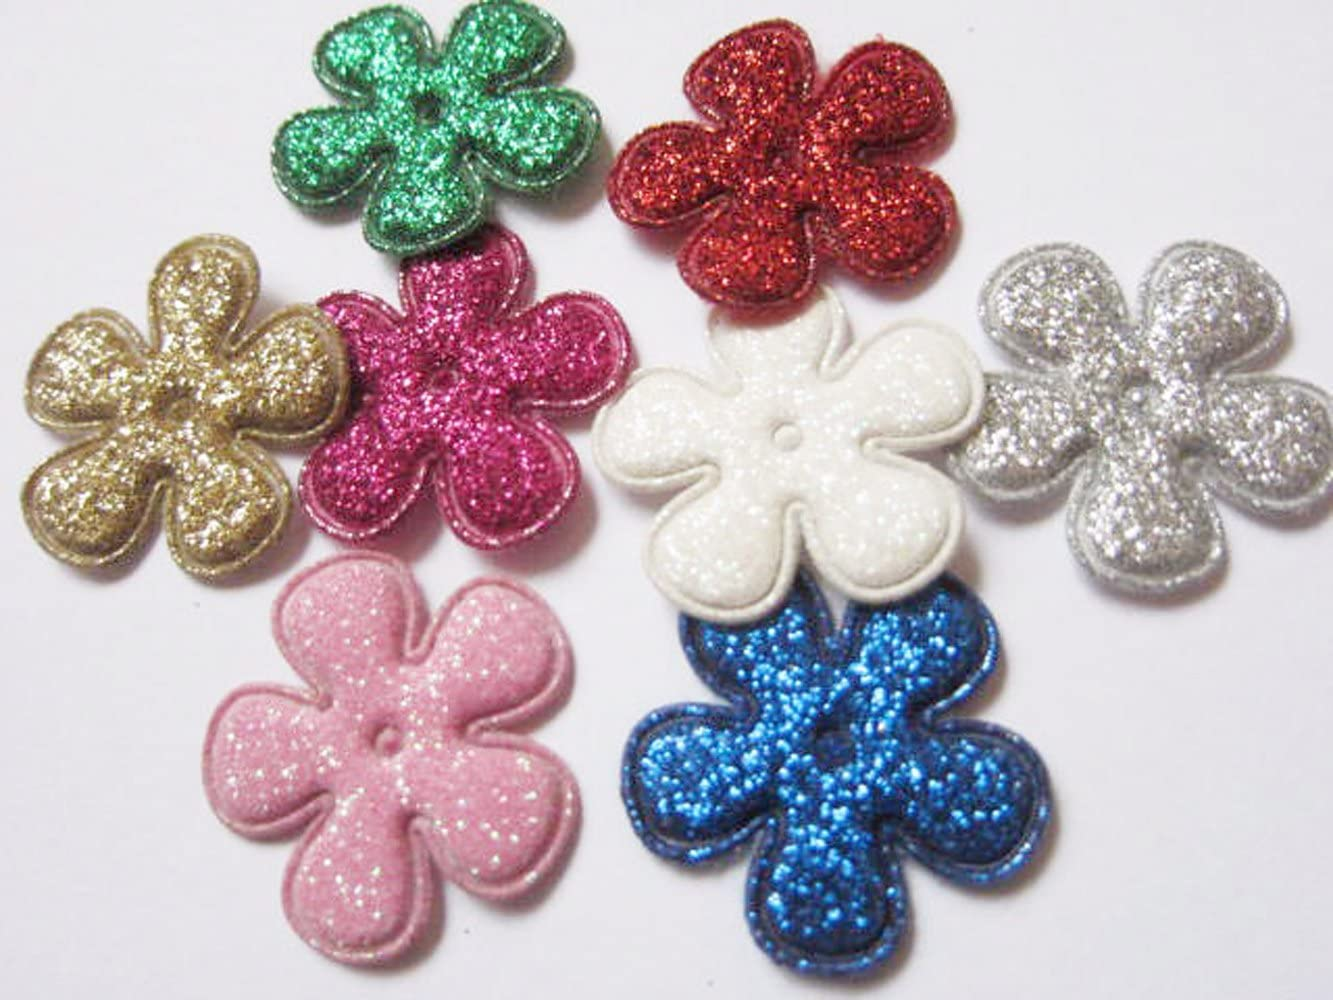 YYCRAFT Pack of 80 Glitter 1